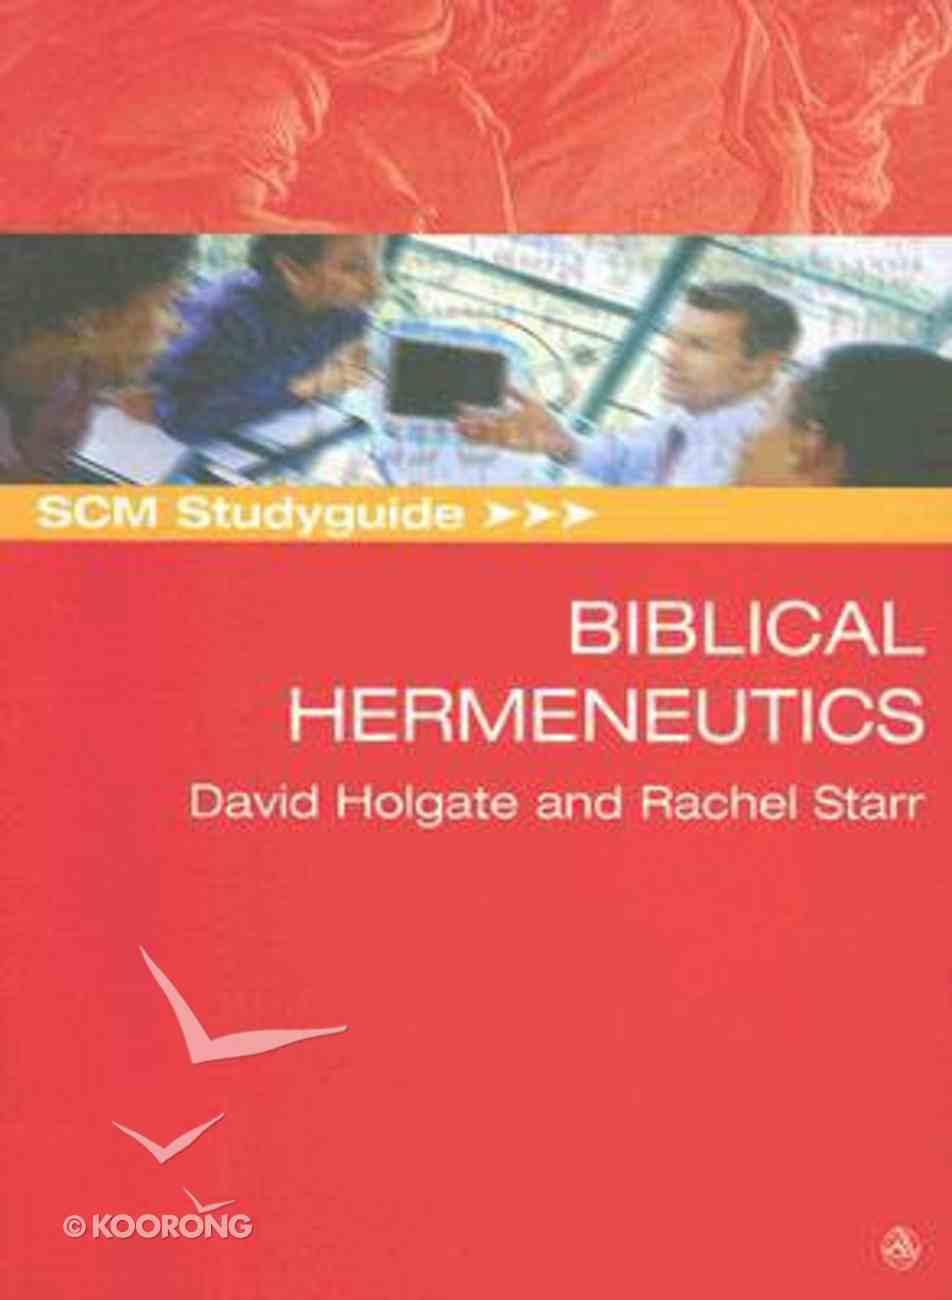 Scm Study Guide: Biblical Hermeneutics (Scm Studyguide Series) Paperback